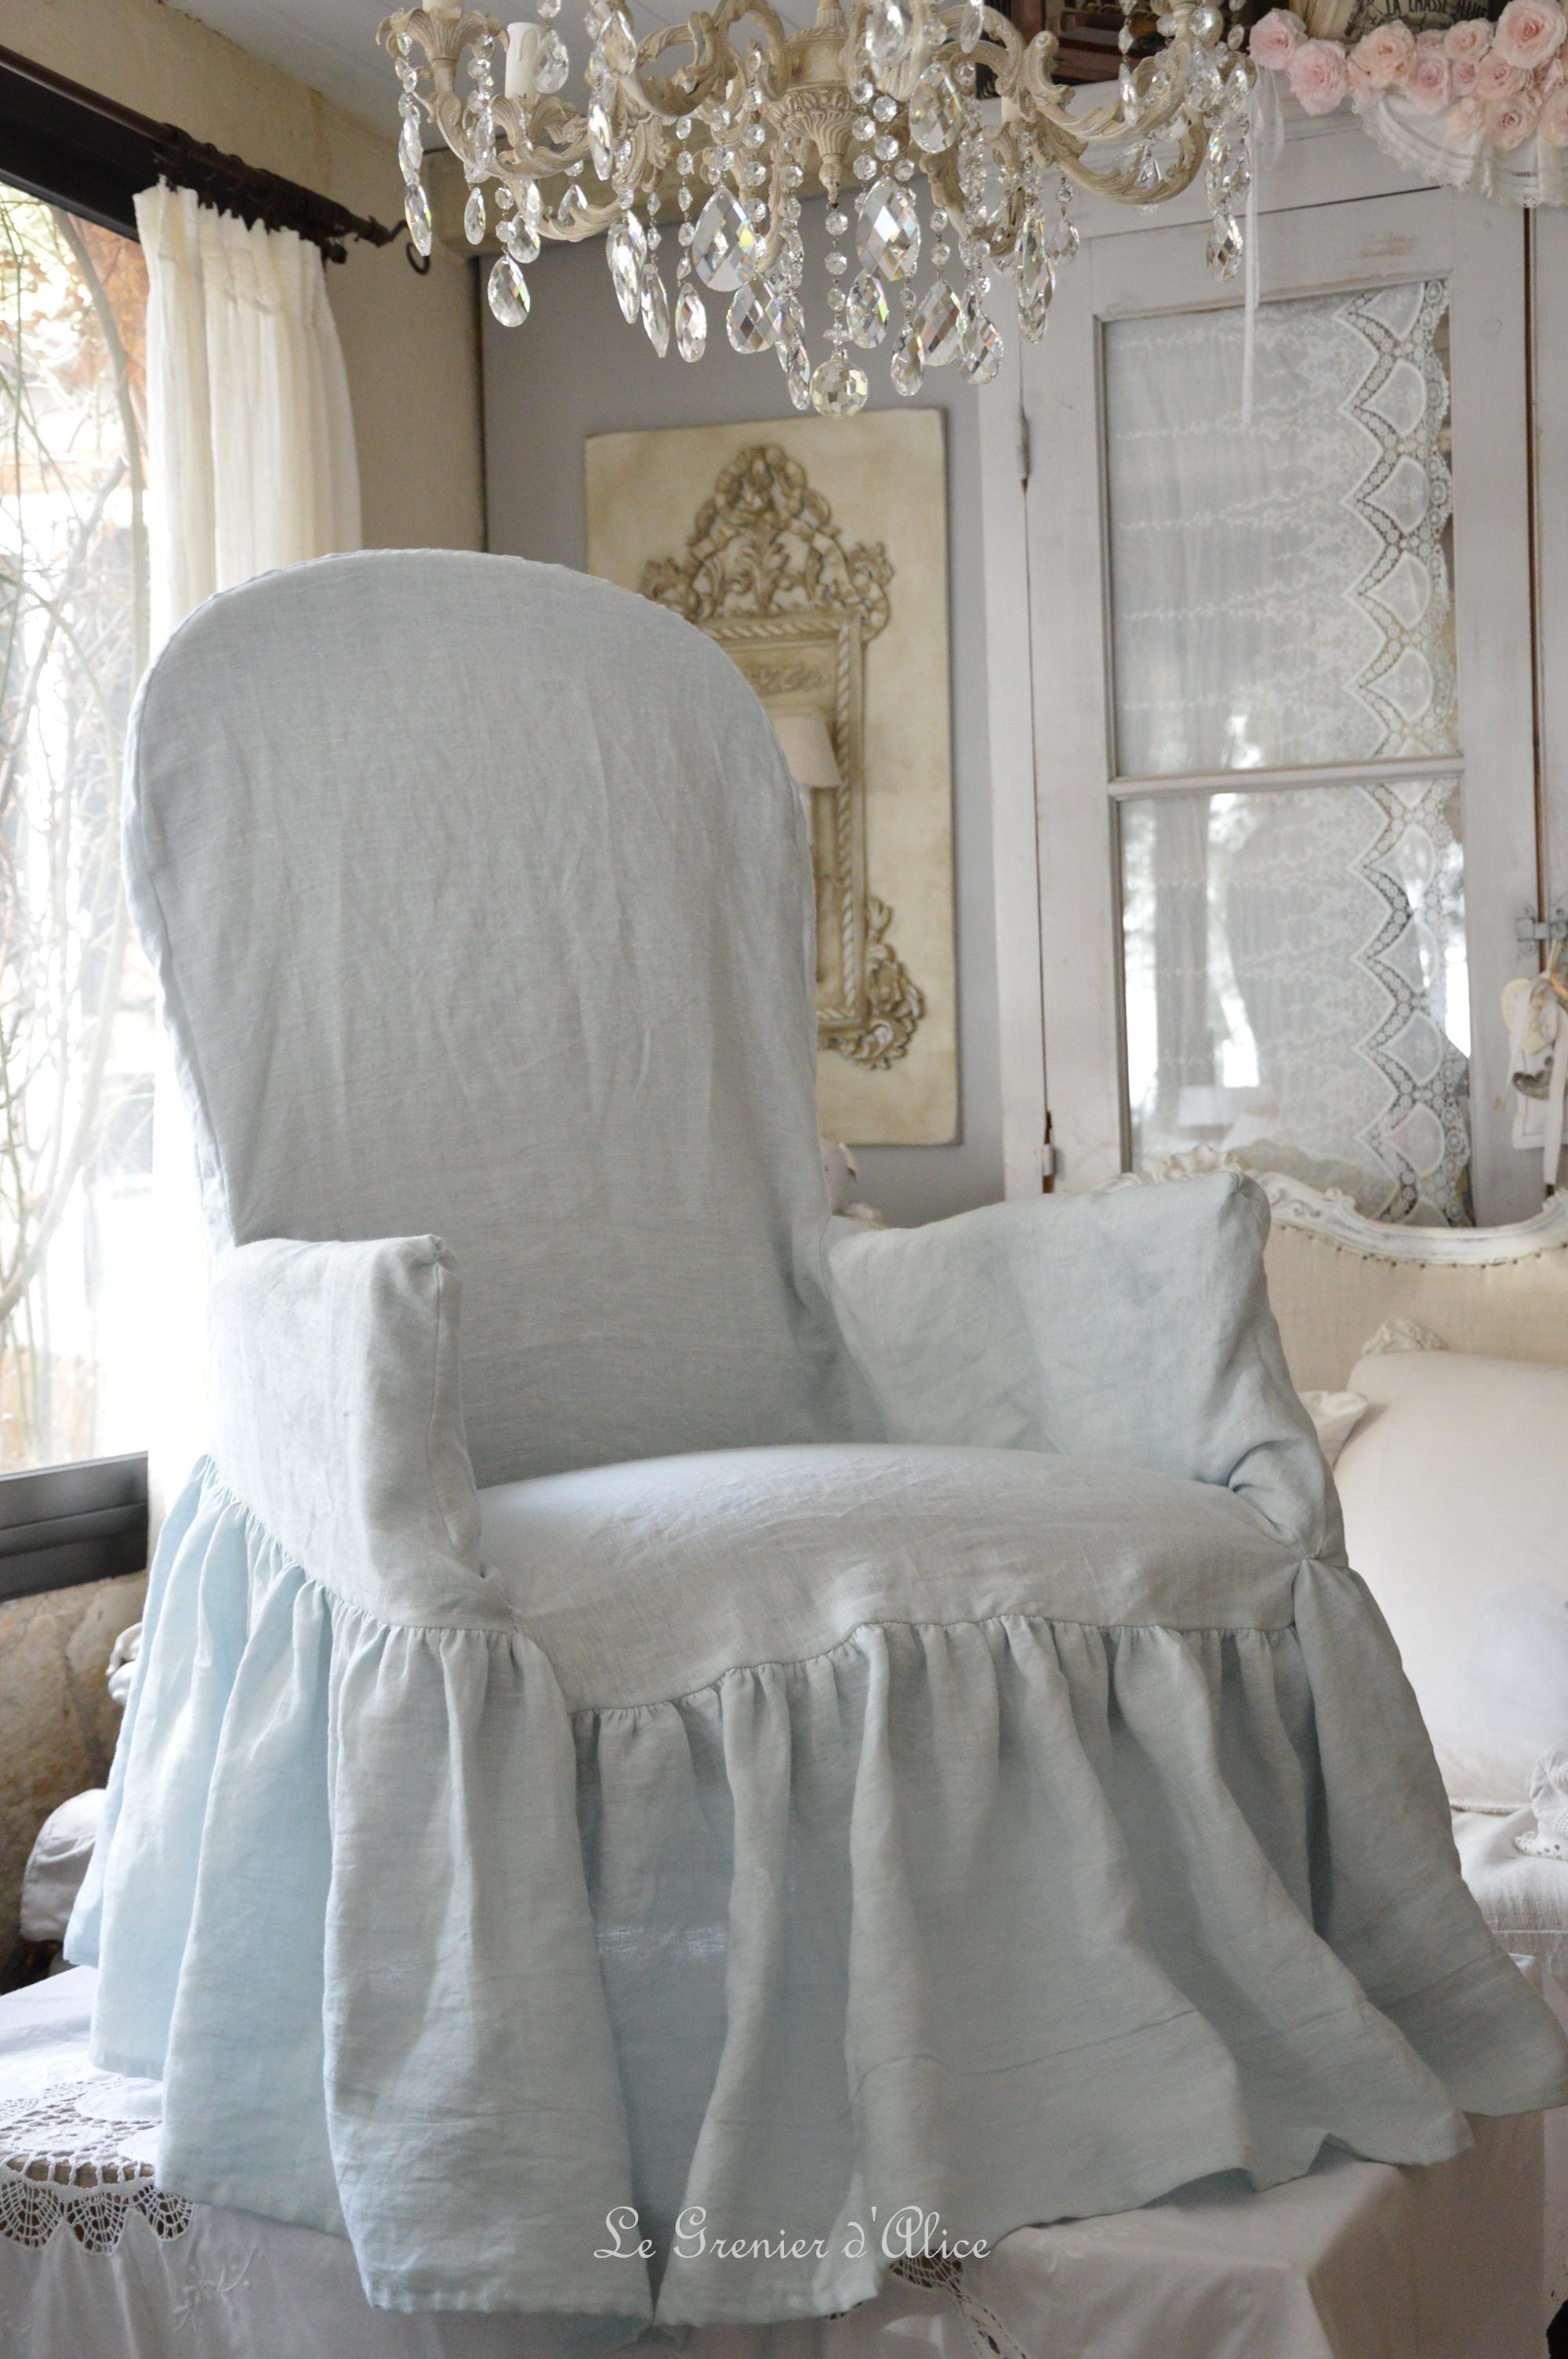 housse fauteuil voltaire housse romantique et shabby chic lin lav stone washed blanc rose. Black Bedroom Furniture Sets. Home Design Ideas